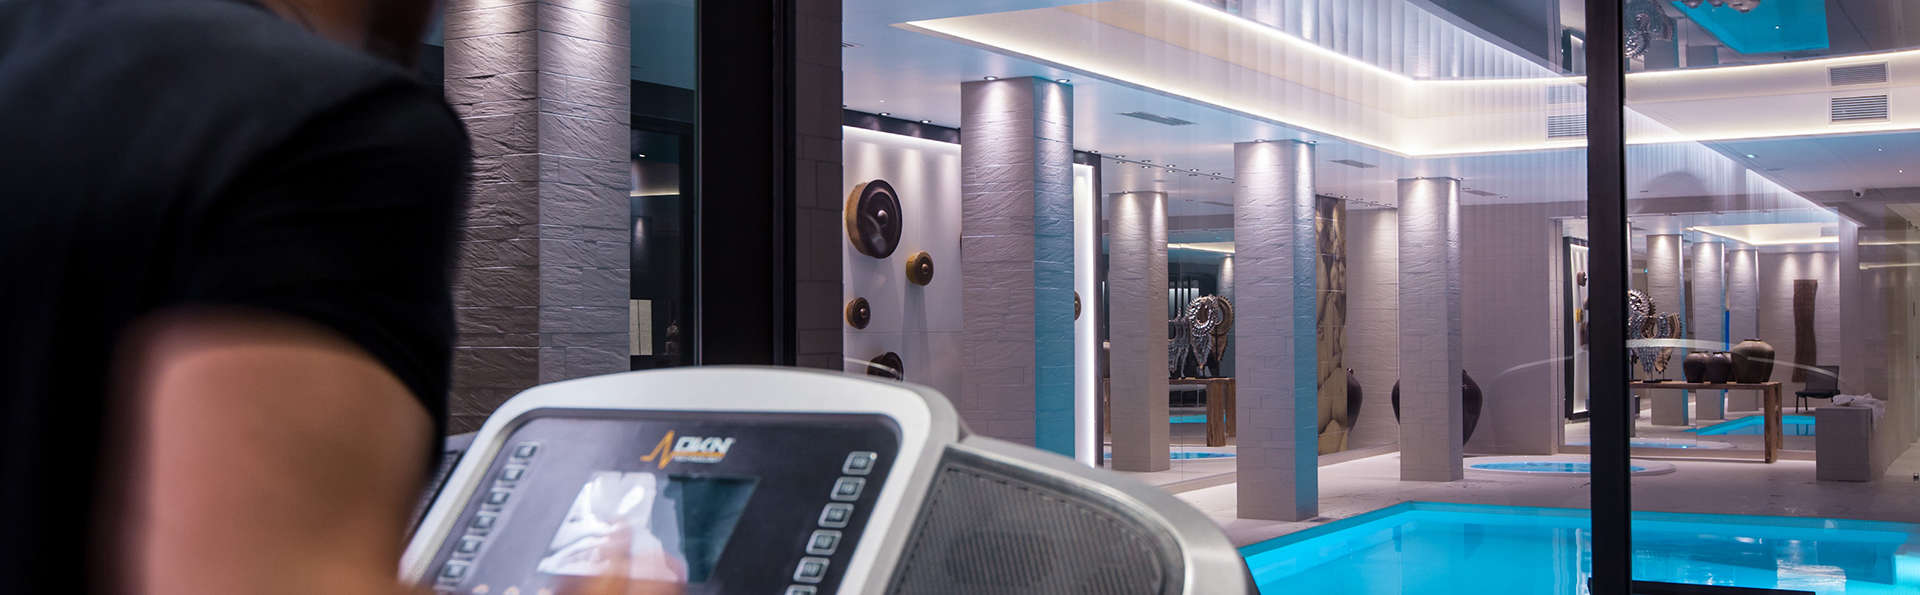 Best Western Plus - Hôtel de Chassieu - EDIT_fitness.jpg